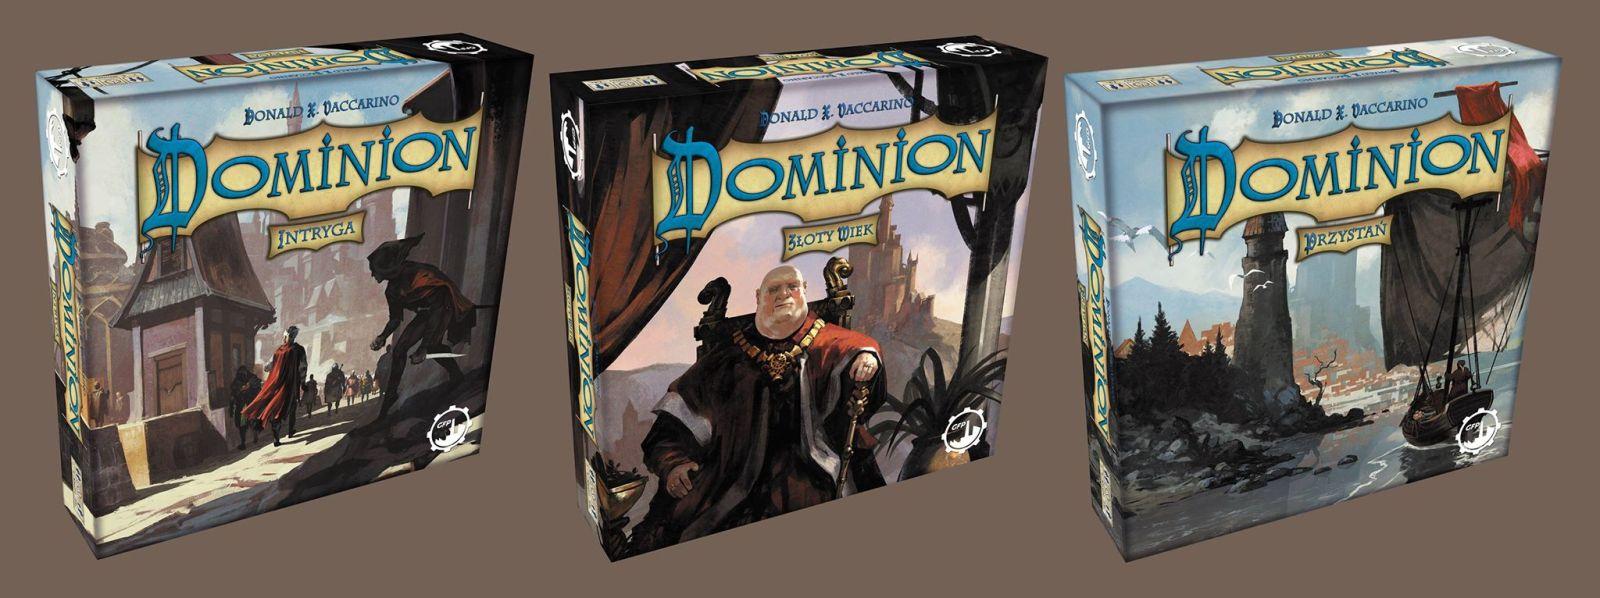 Dominion dodatki 03